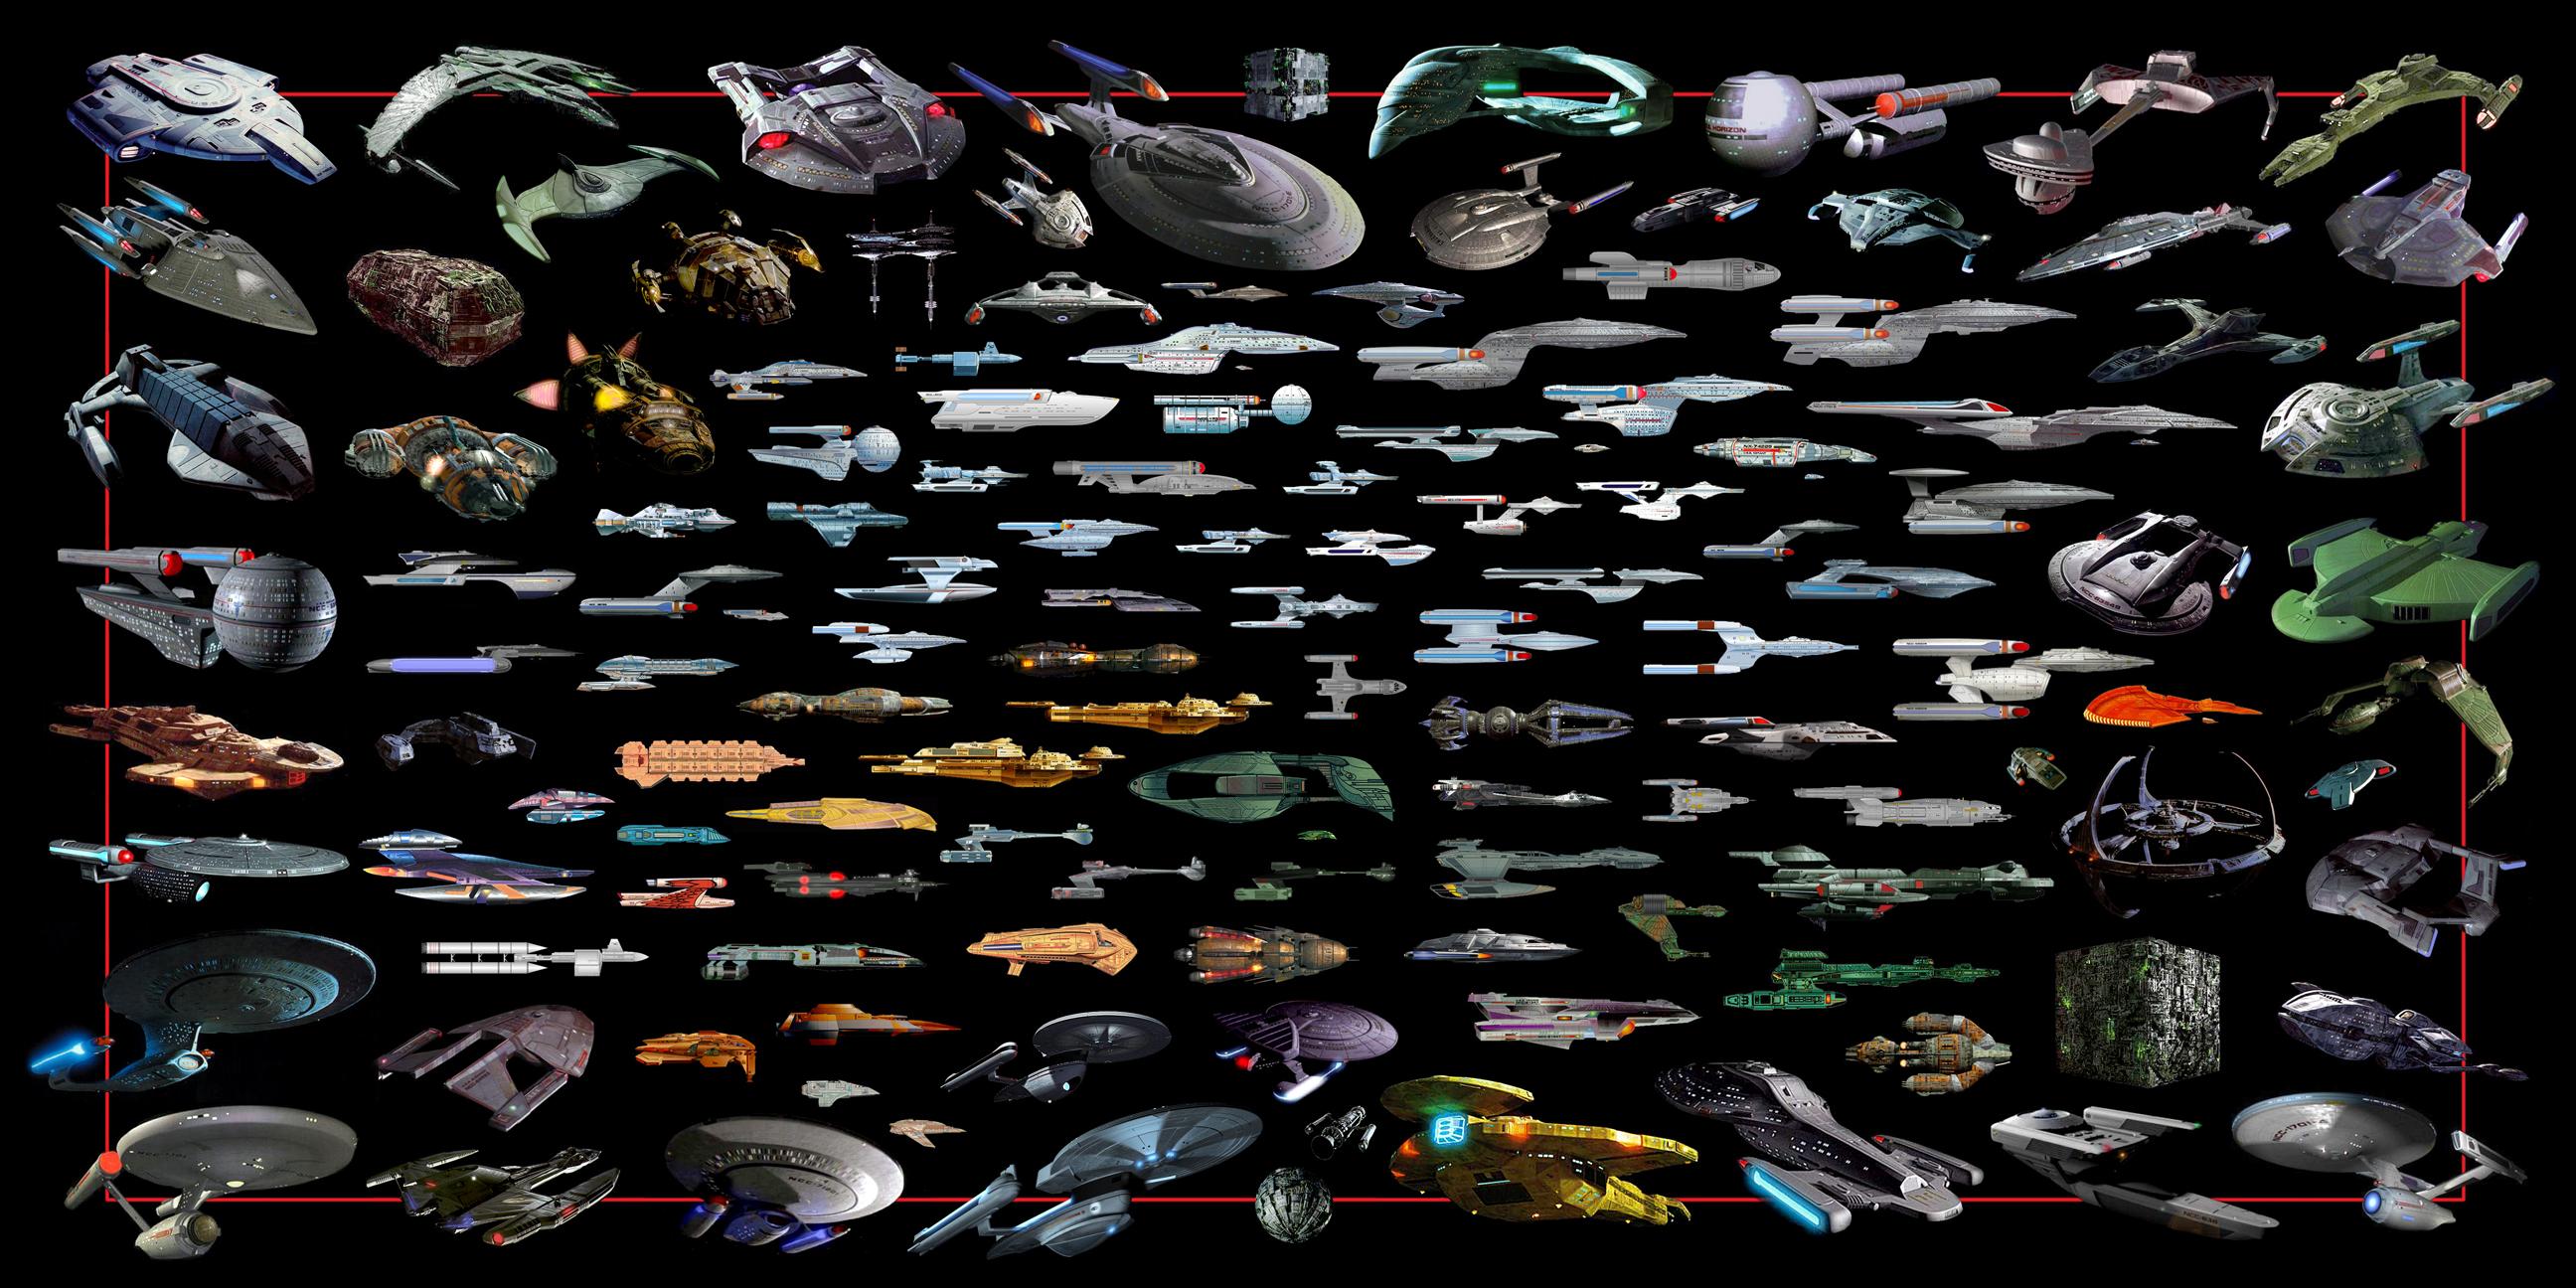 33 Enterprise Star Trek Hd Wallpapers Background Images